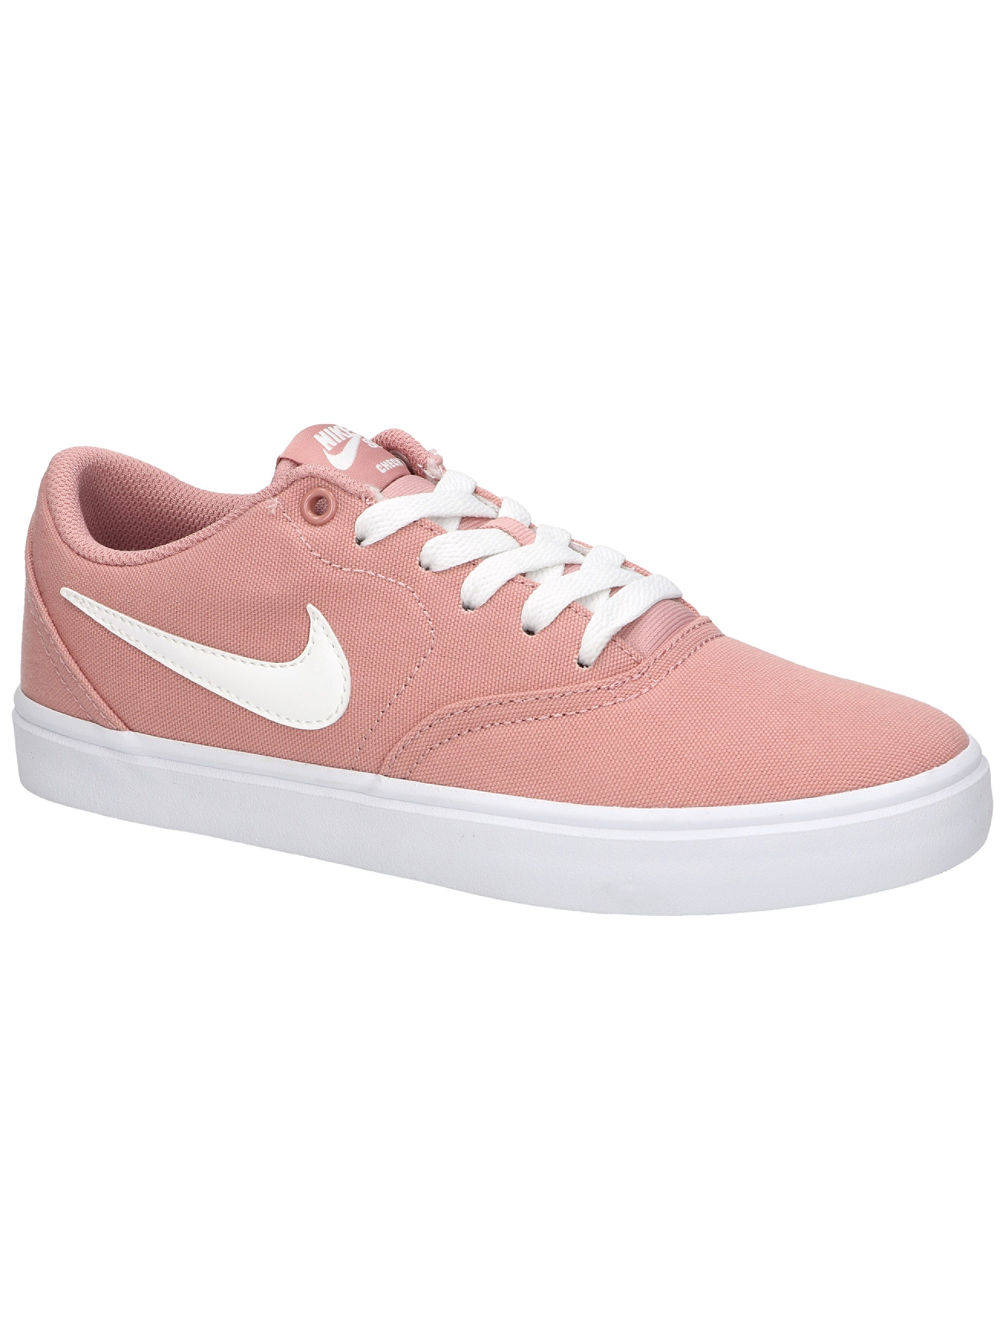 various colors 188ef 01c23 SB Check Solarsoft Canvas Zapatillas deportivas Women. Nike